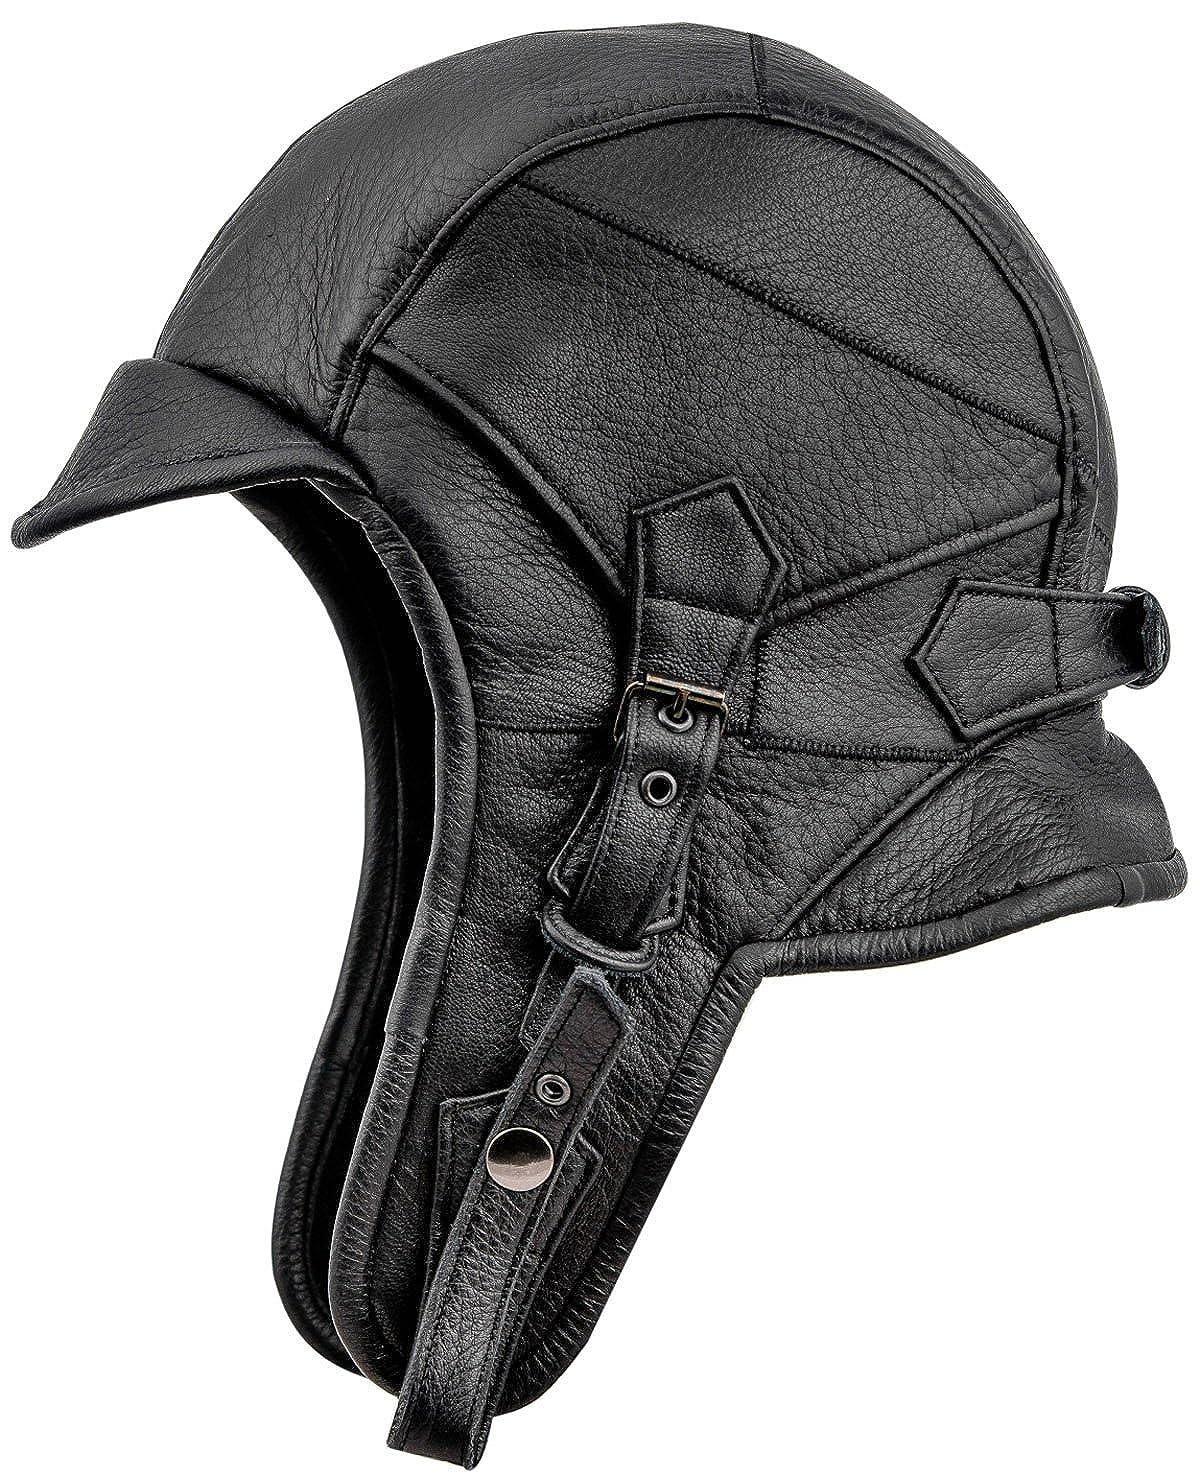 0a1c41b4f Sterkowski Genuine Leather 8 Aviator Helmet Trapper Cap